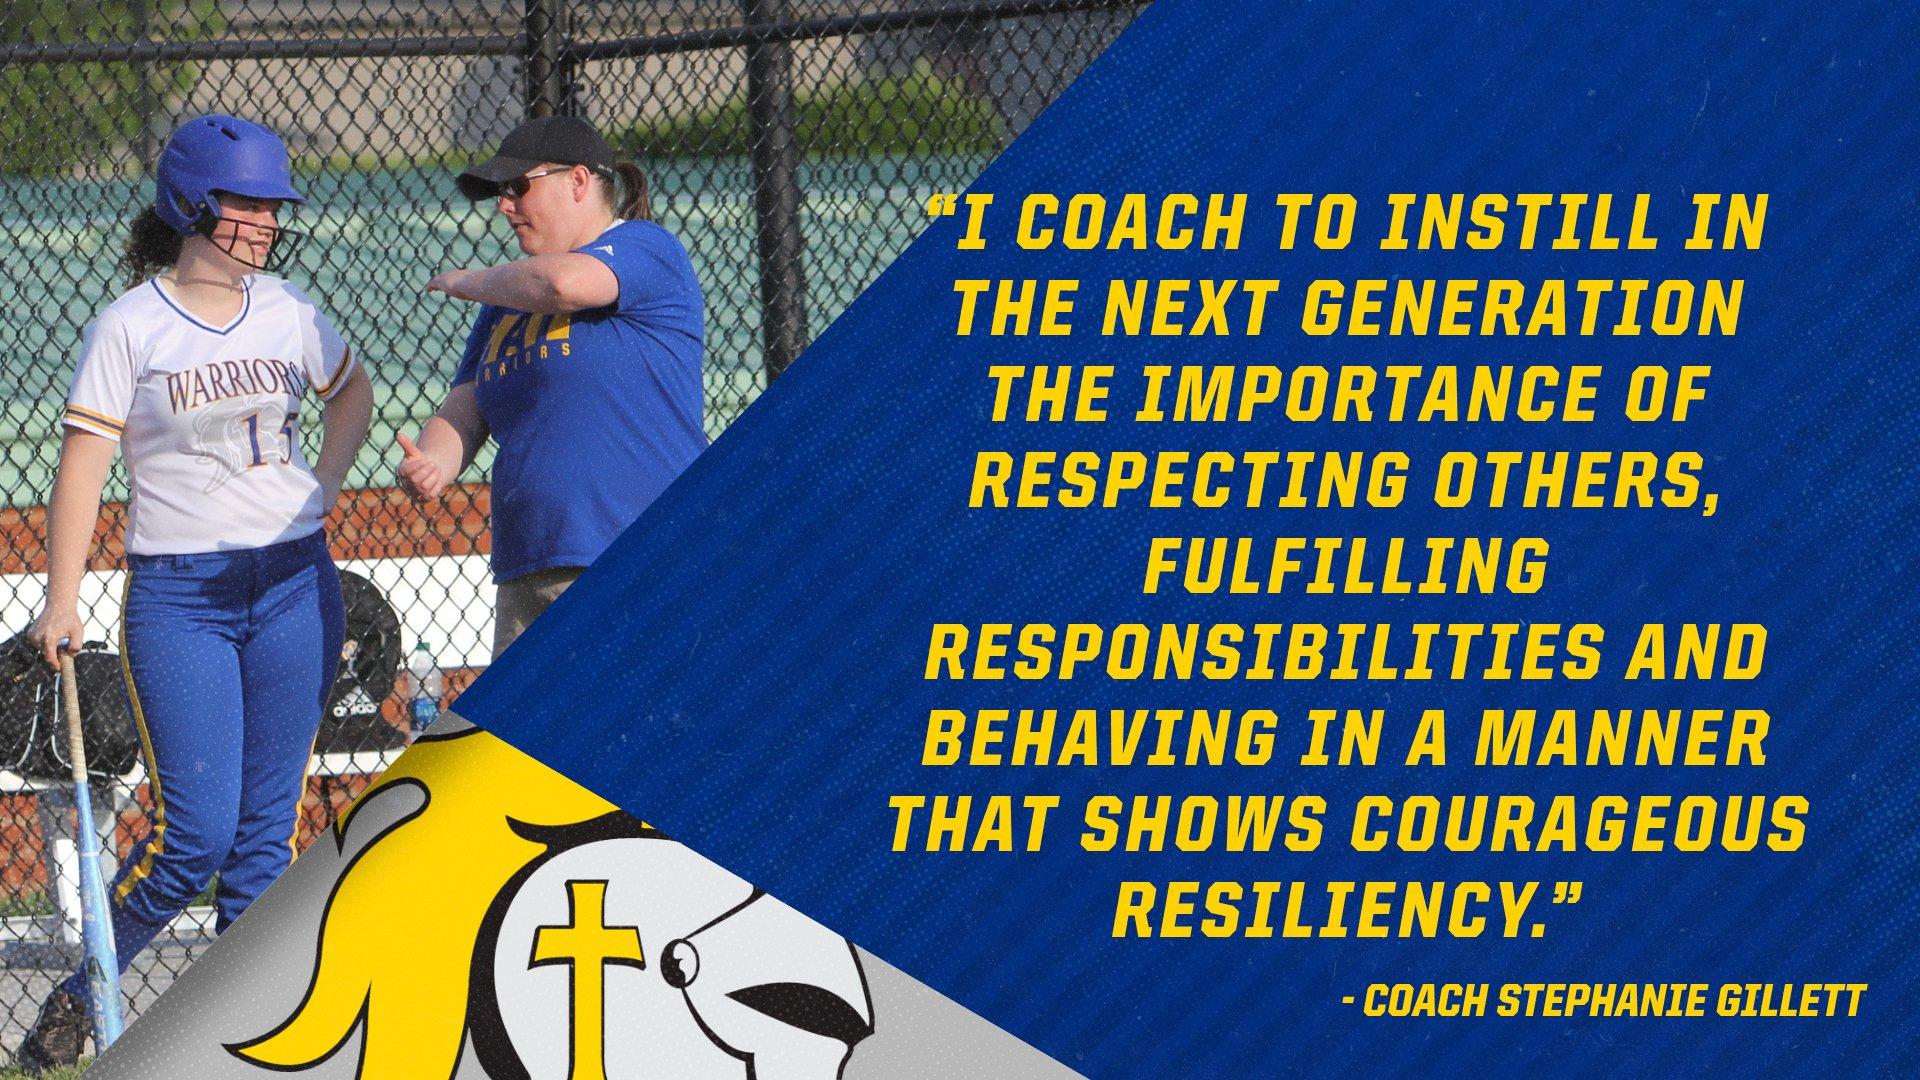 Christian Academy School System | Christian Academy of Indiana | Softball | Coach Gillett's Transformational Purpose